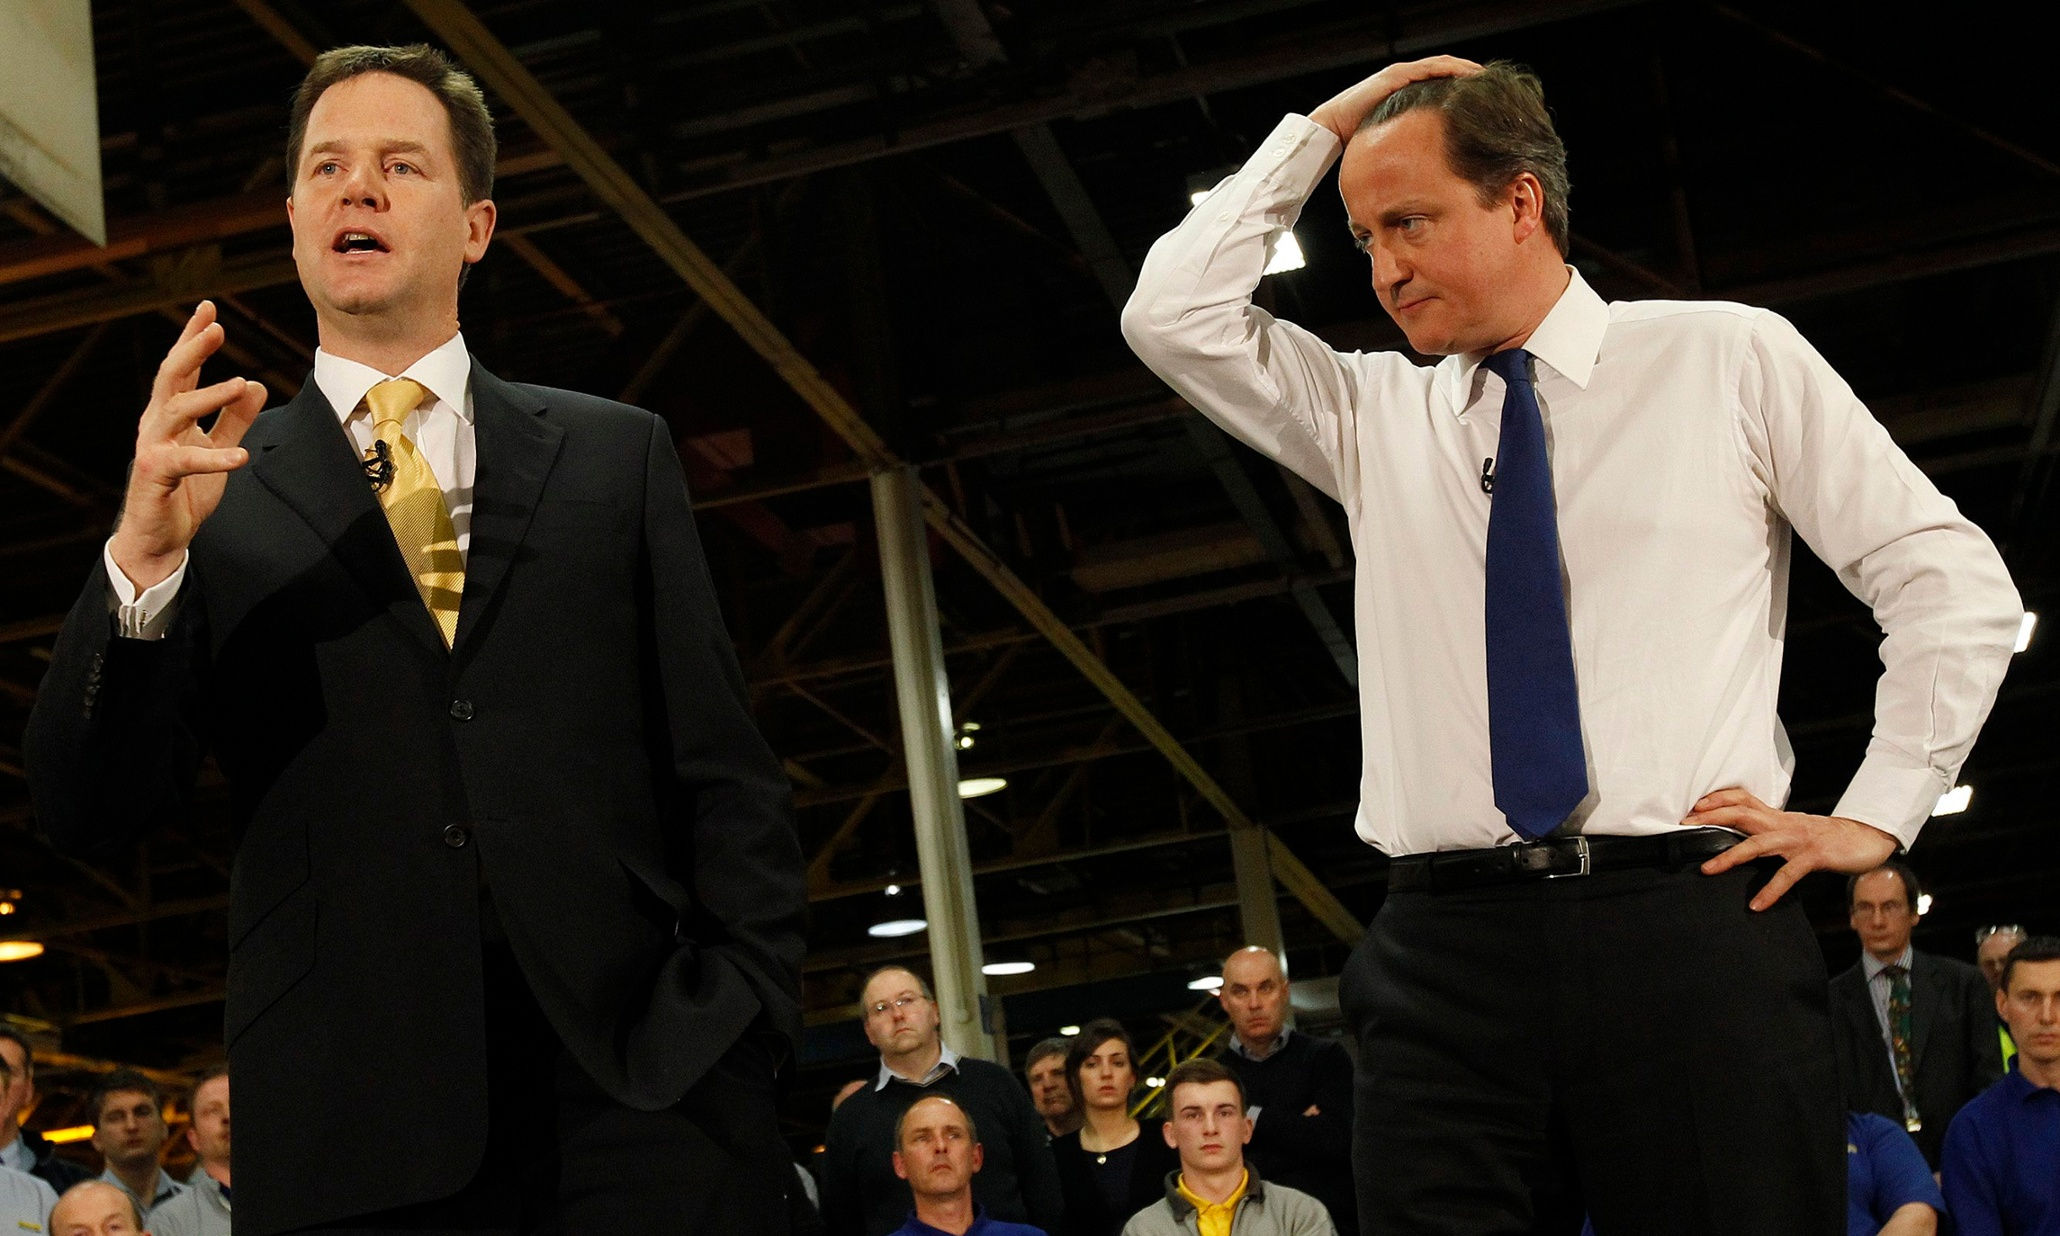 Coalition Britain in 12 charts